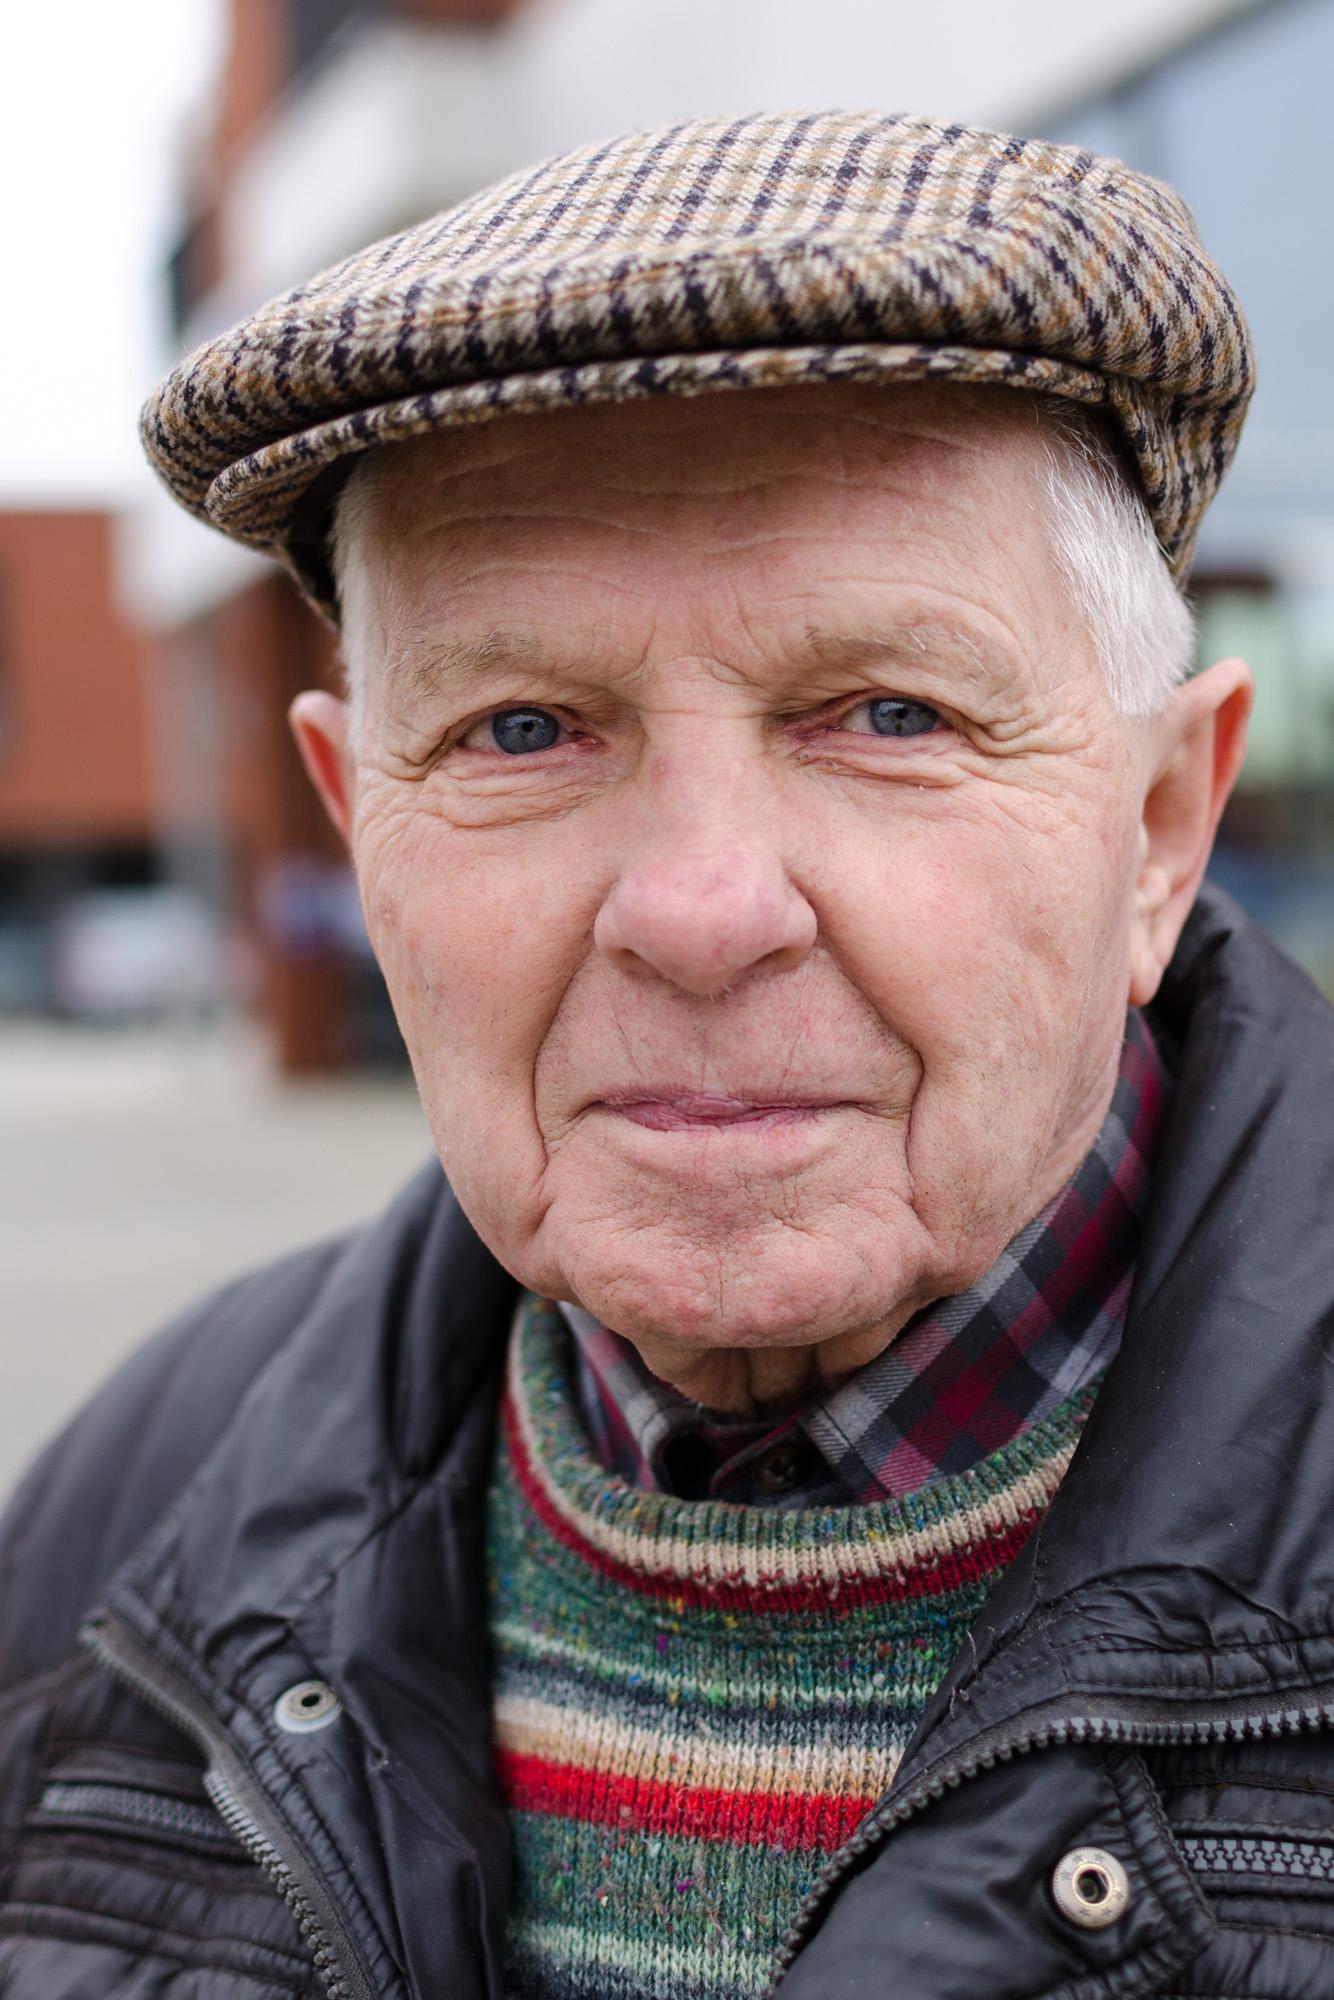 Portret man met pet - straatfotografie :: foto-rv